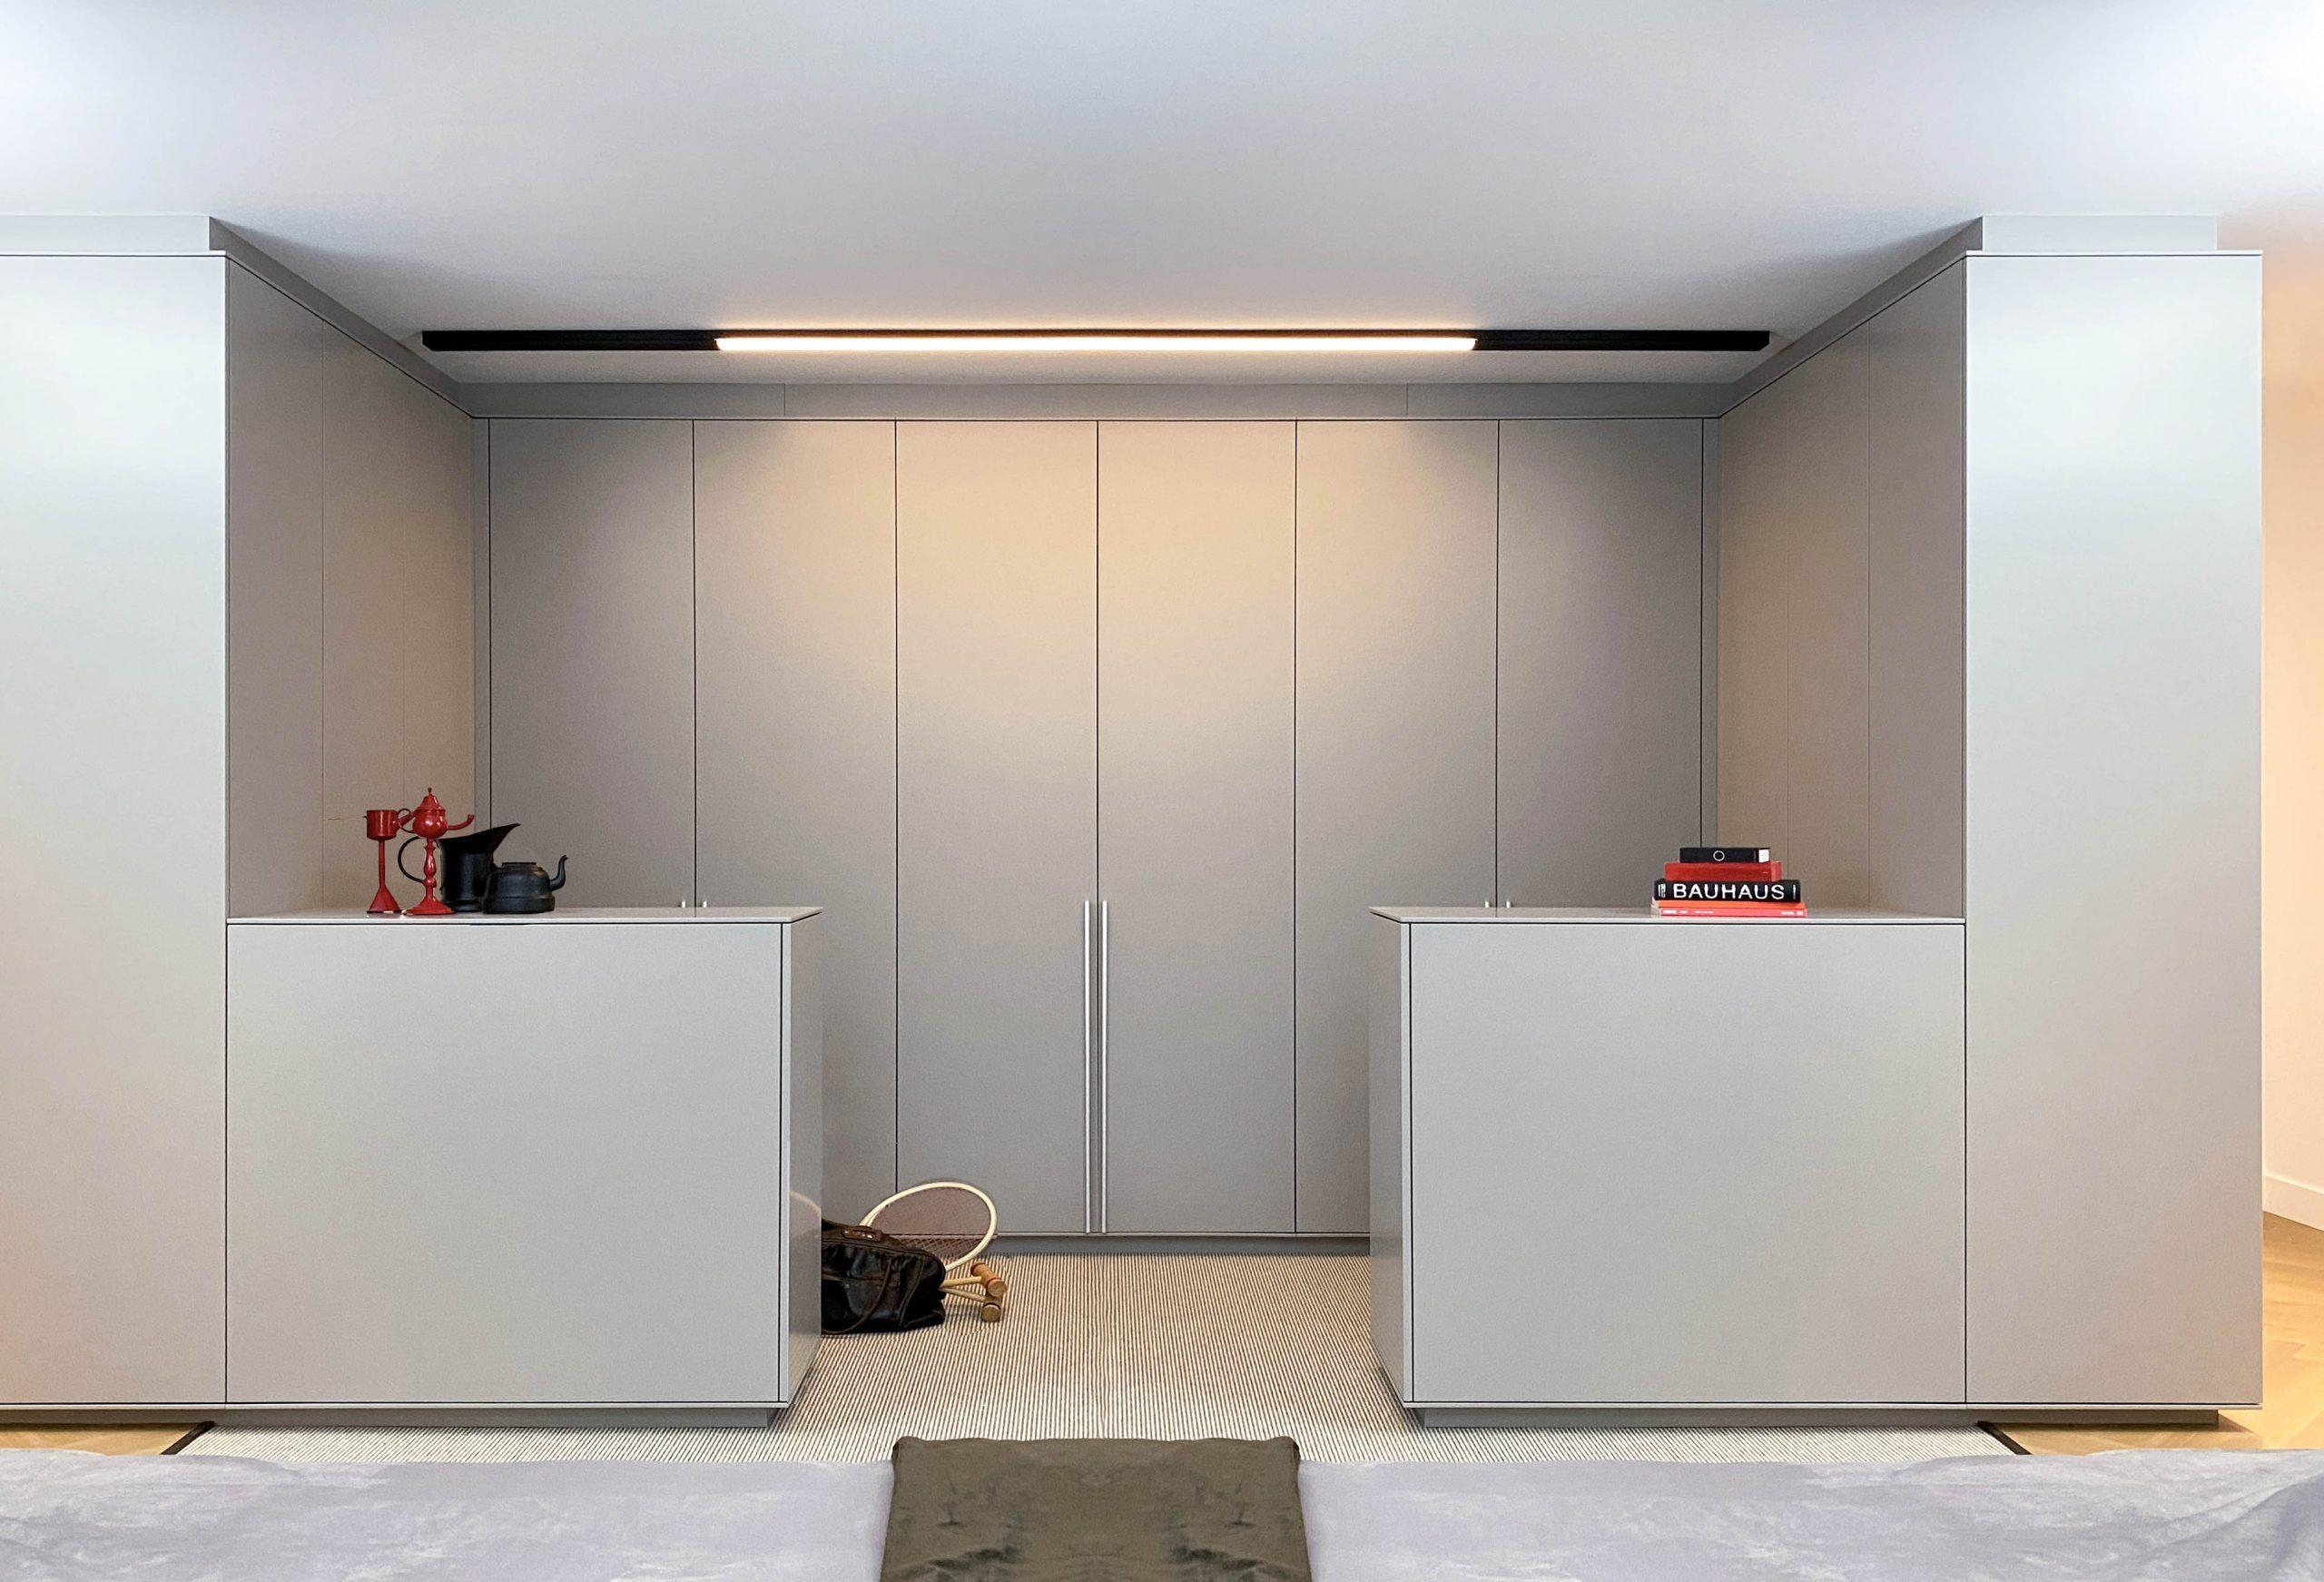 1200-3-design-kledingkast-wardrobe-i-aanzicht-hang-en-leggedeelte-dressoir